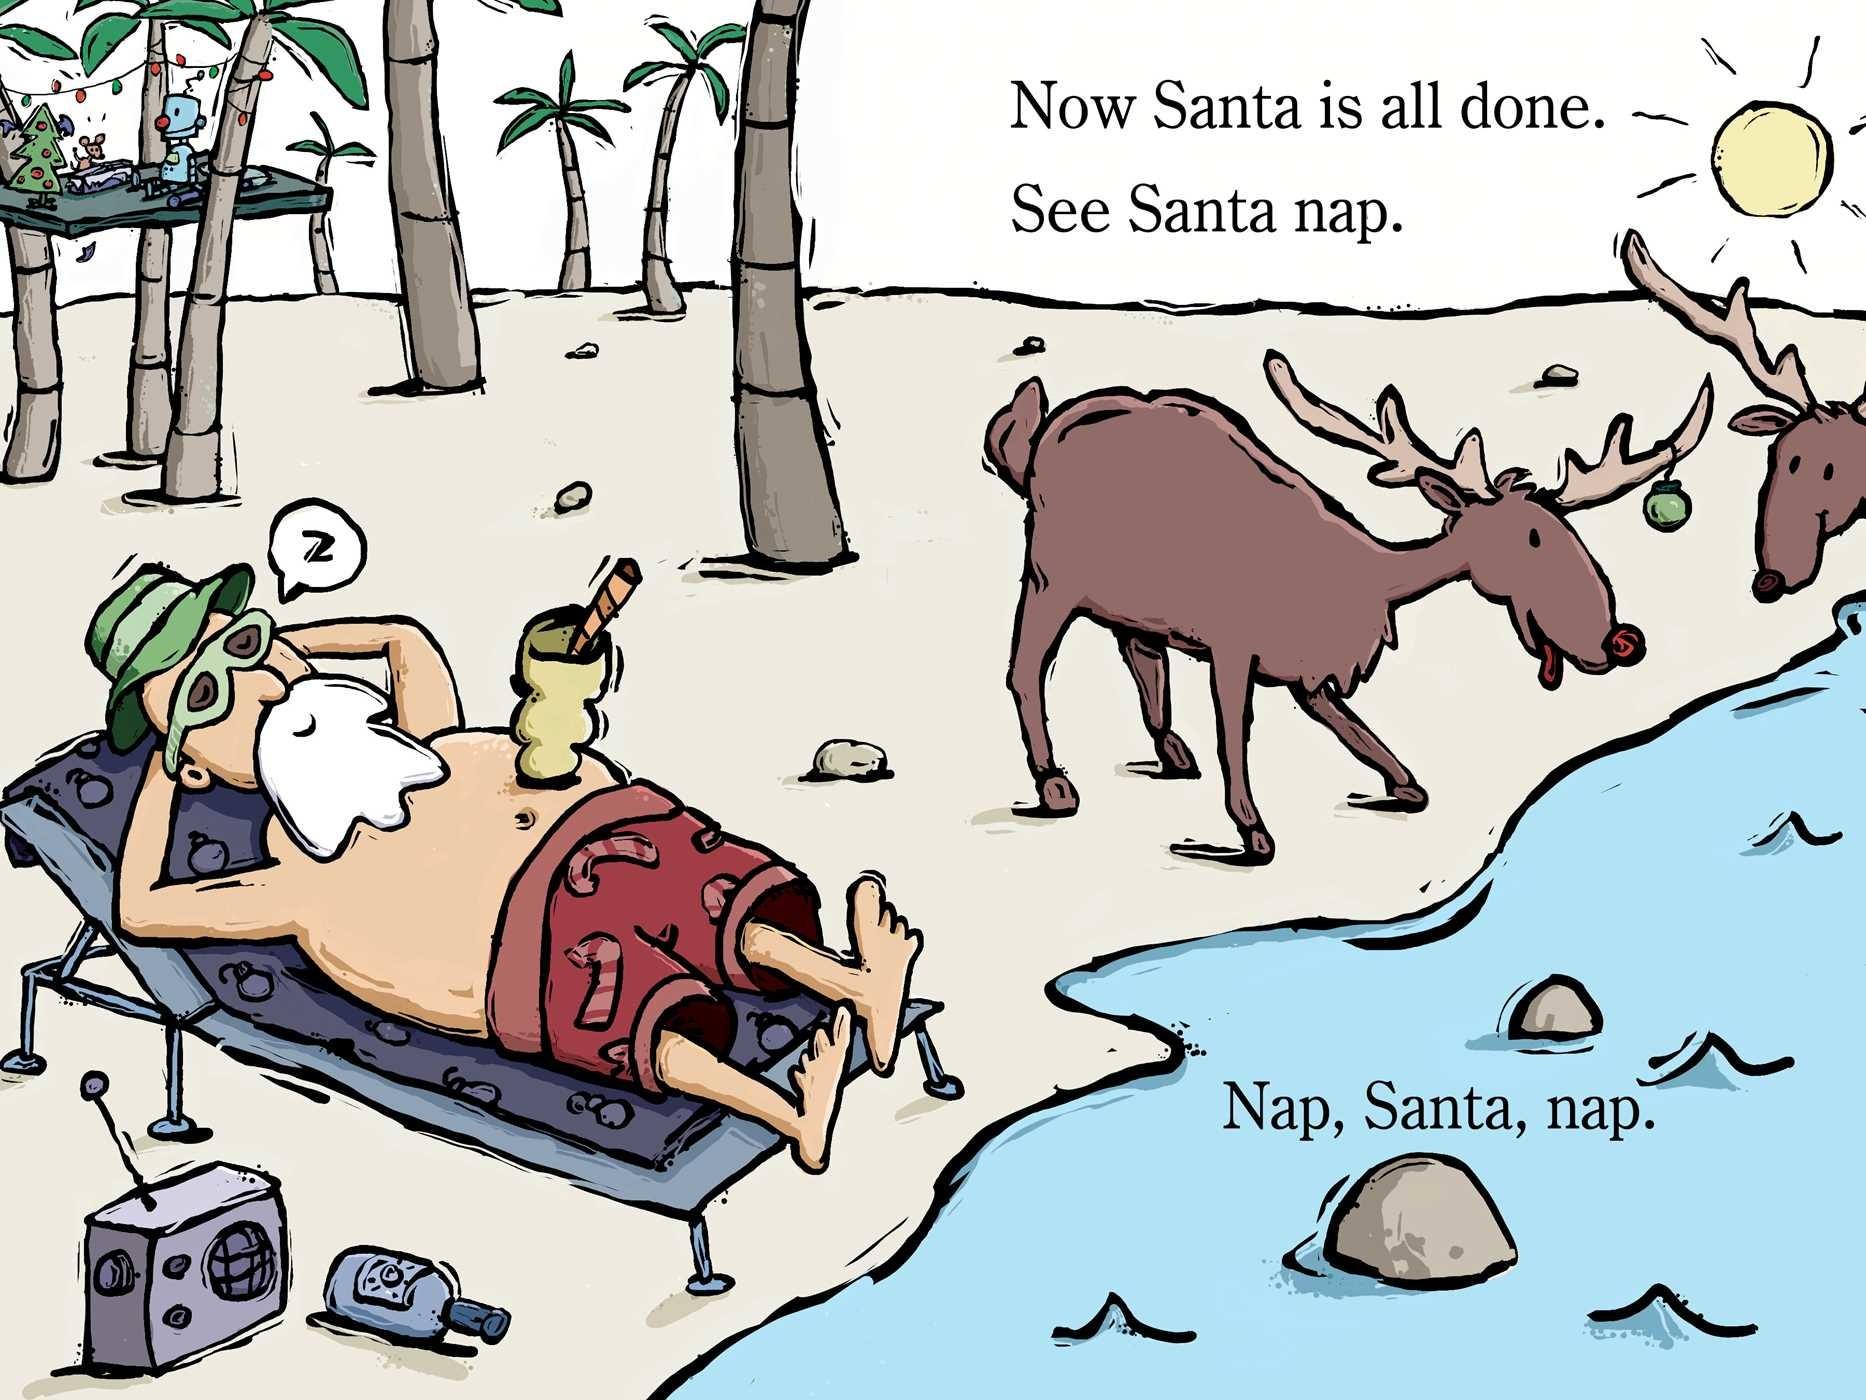 See santa nap 9781481467872.in02